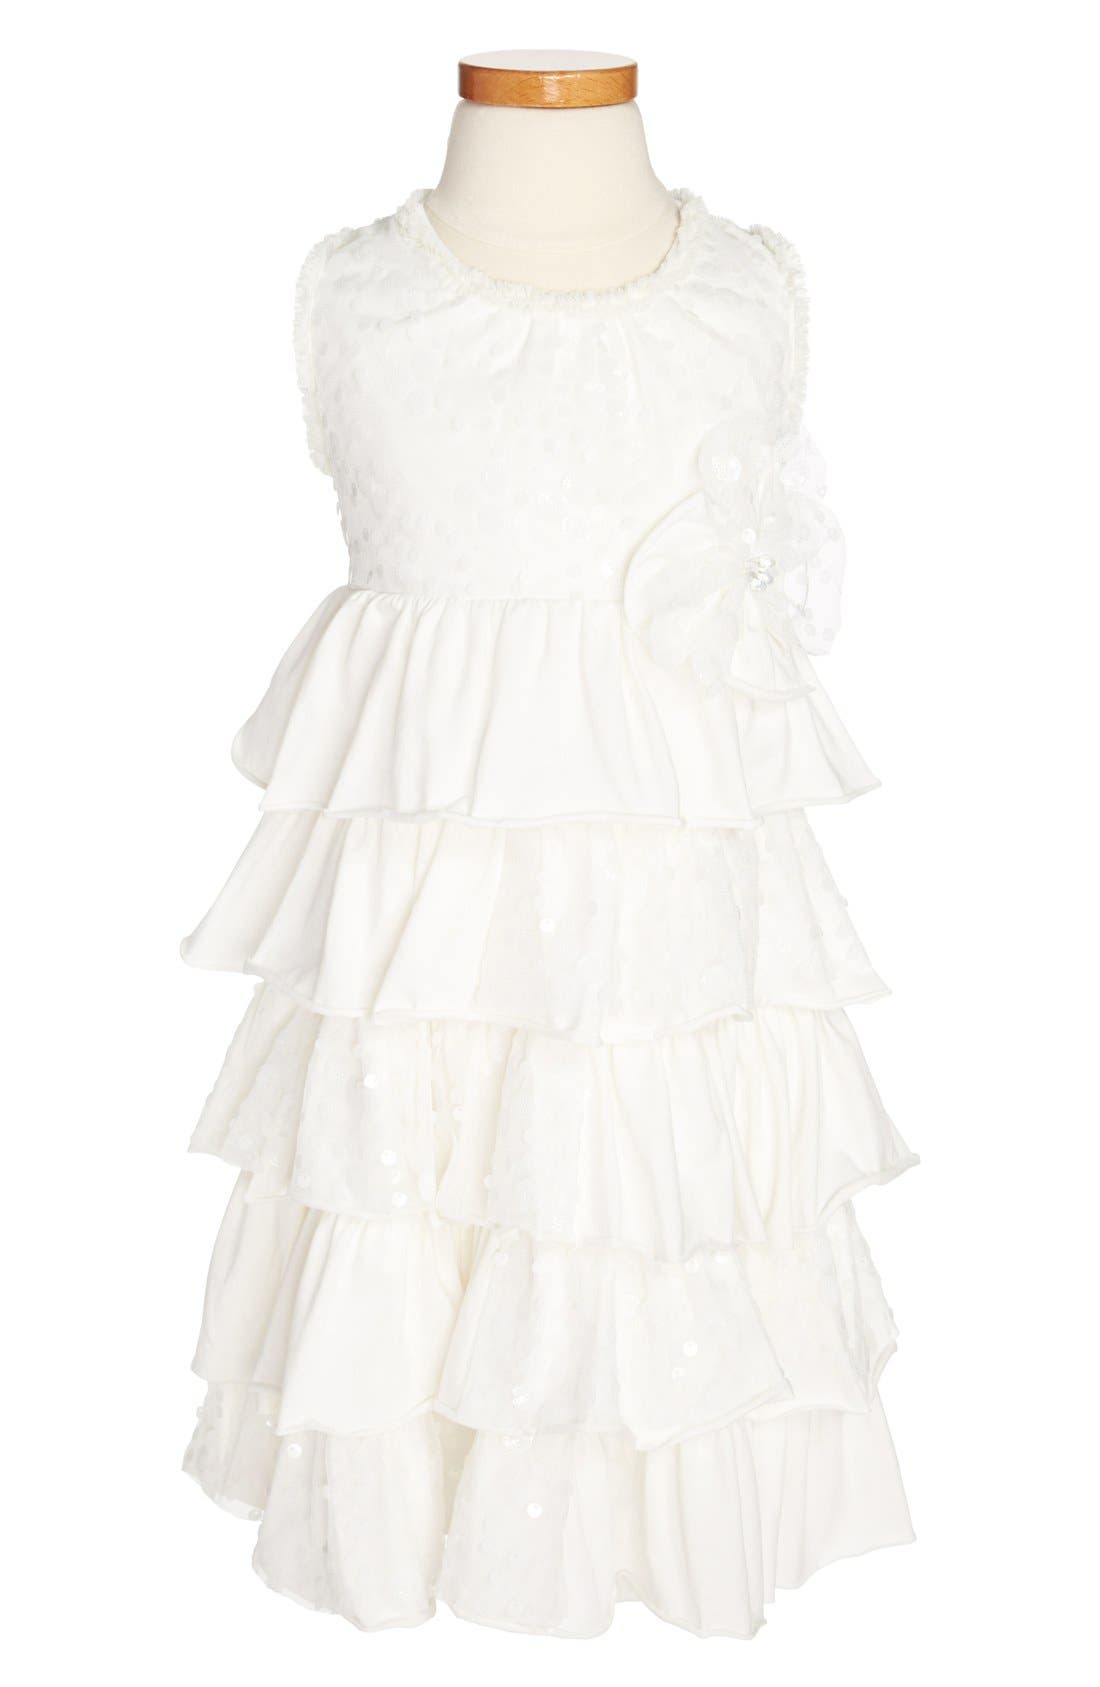 Alternate Image 1 Selected - Isobella & Chloe 'Enchanted' Dress (Little Girls & Big Girls)